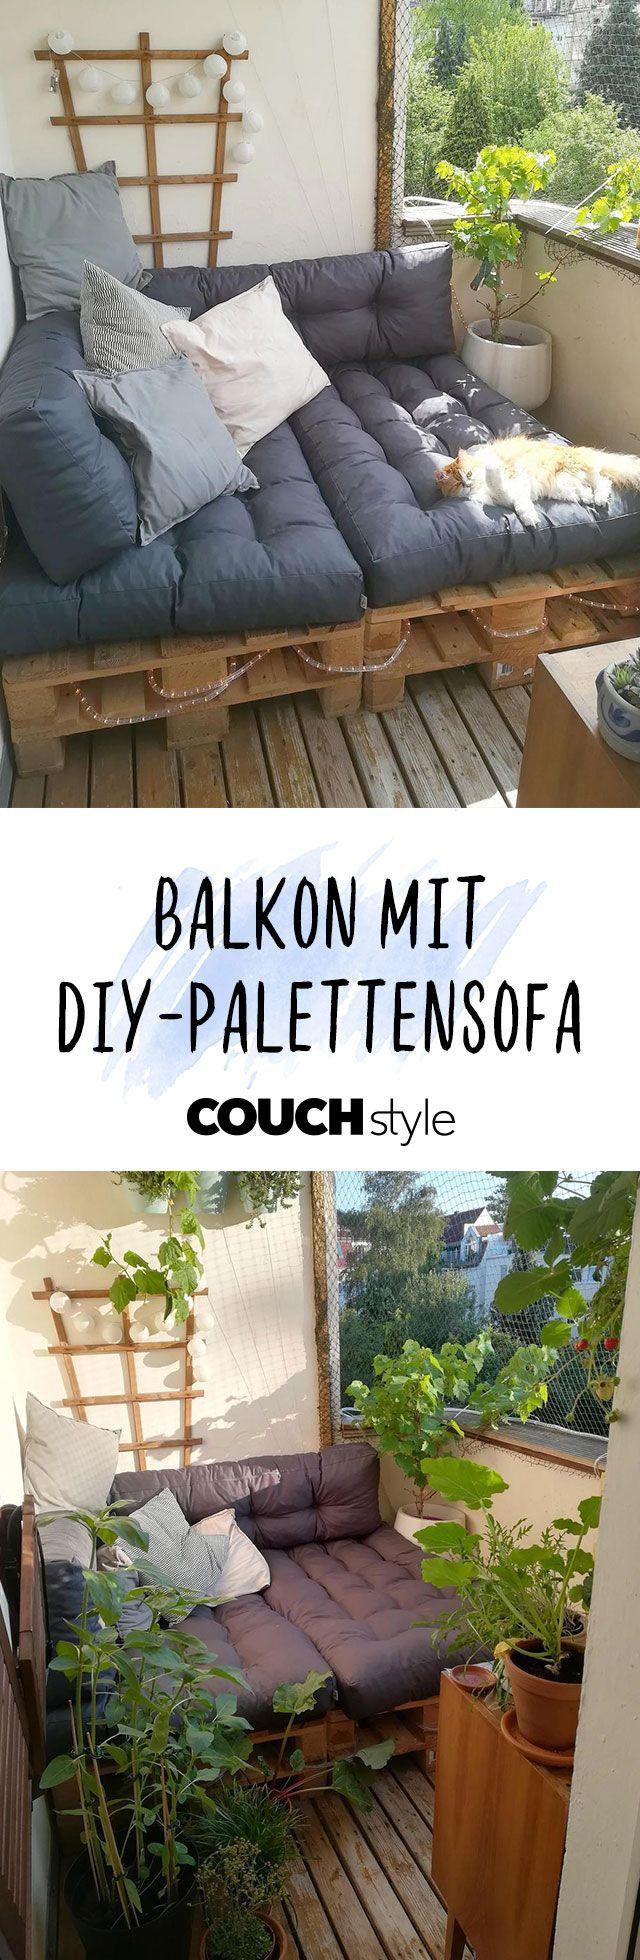 #palettensofa #palettenmöbel #balkon #balkonien #bal... #smallbalconyfurniture